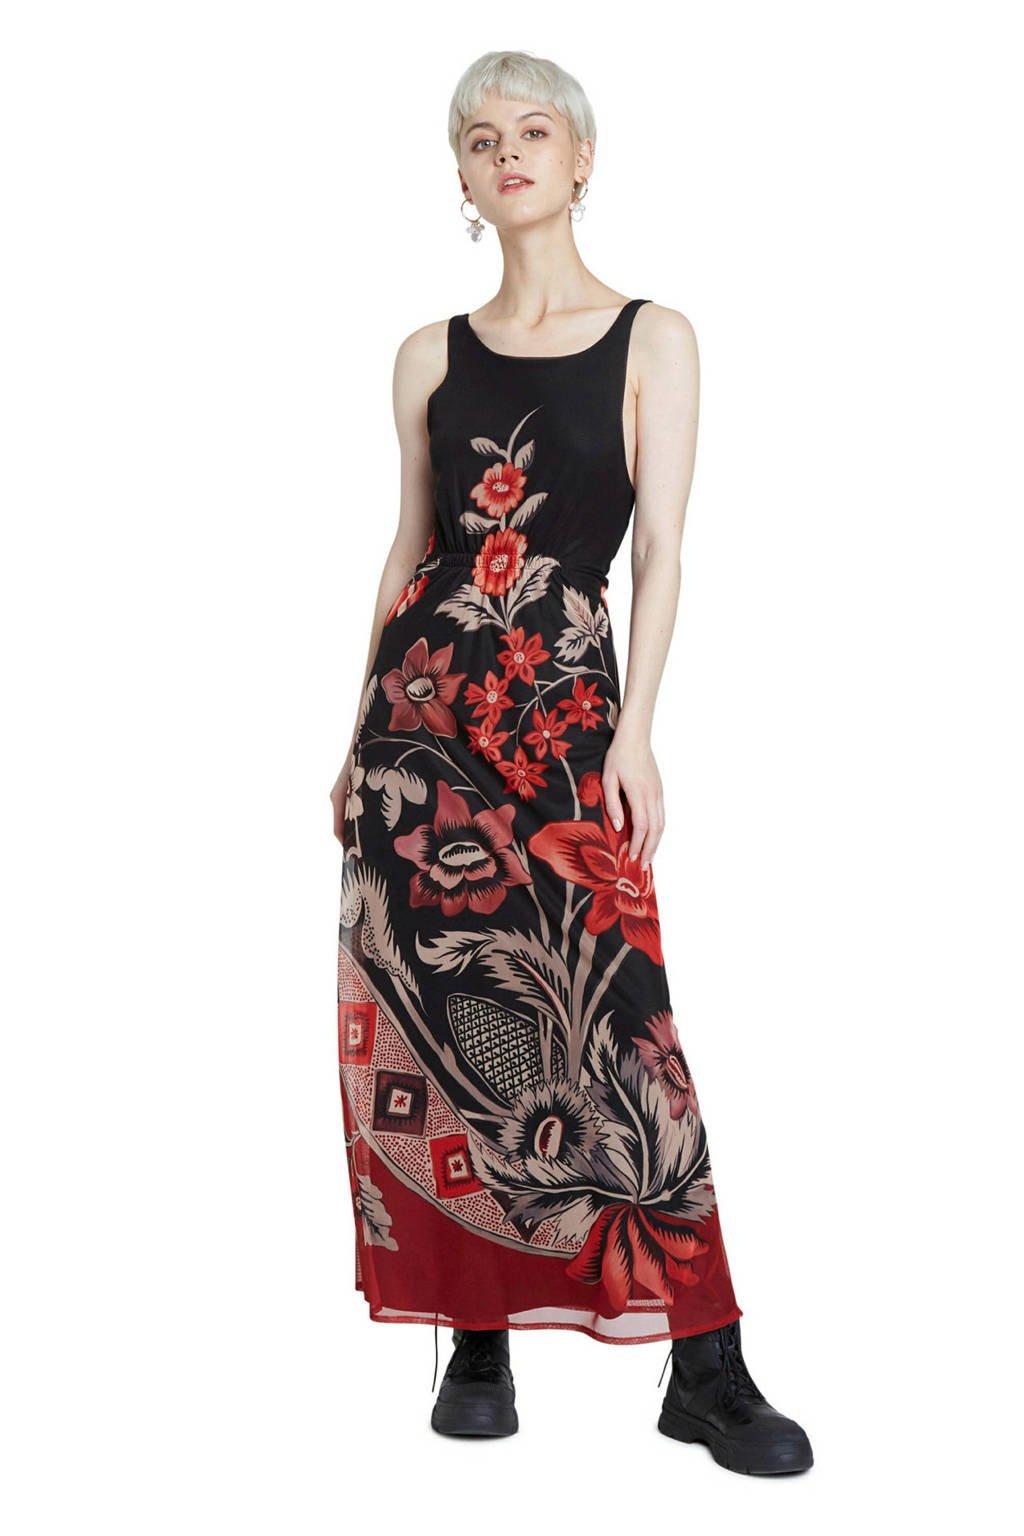 Desigual gebloemde maxi jurk zwart/rood, Zwart/rood